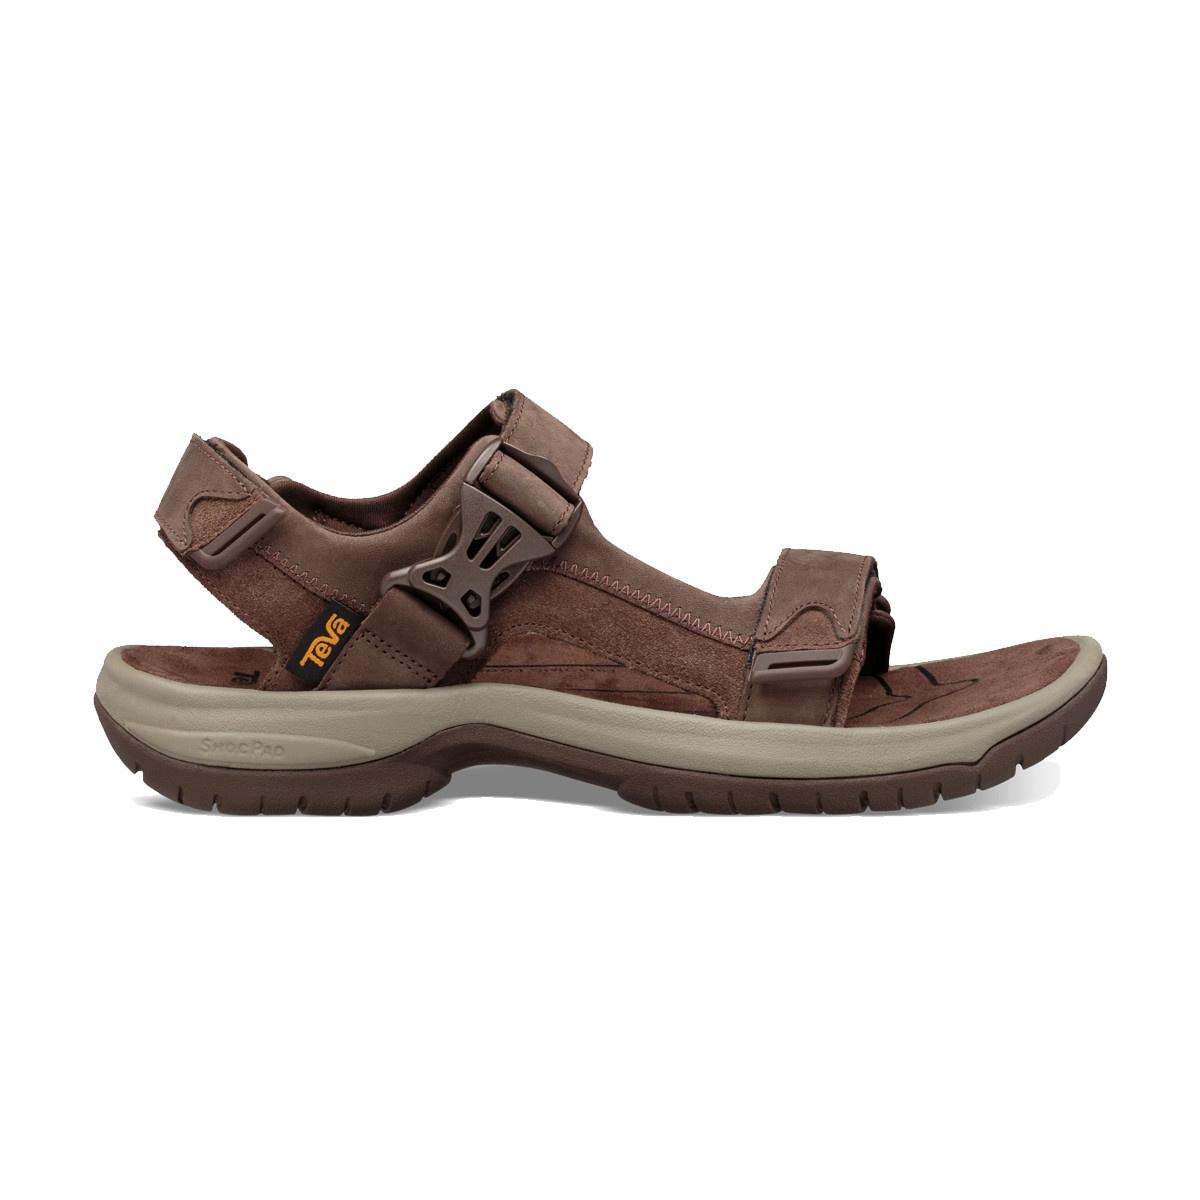 TEVA Teva Men's Tanway Leather Brown